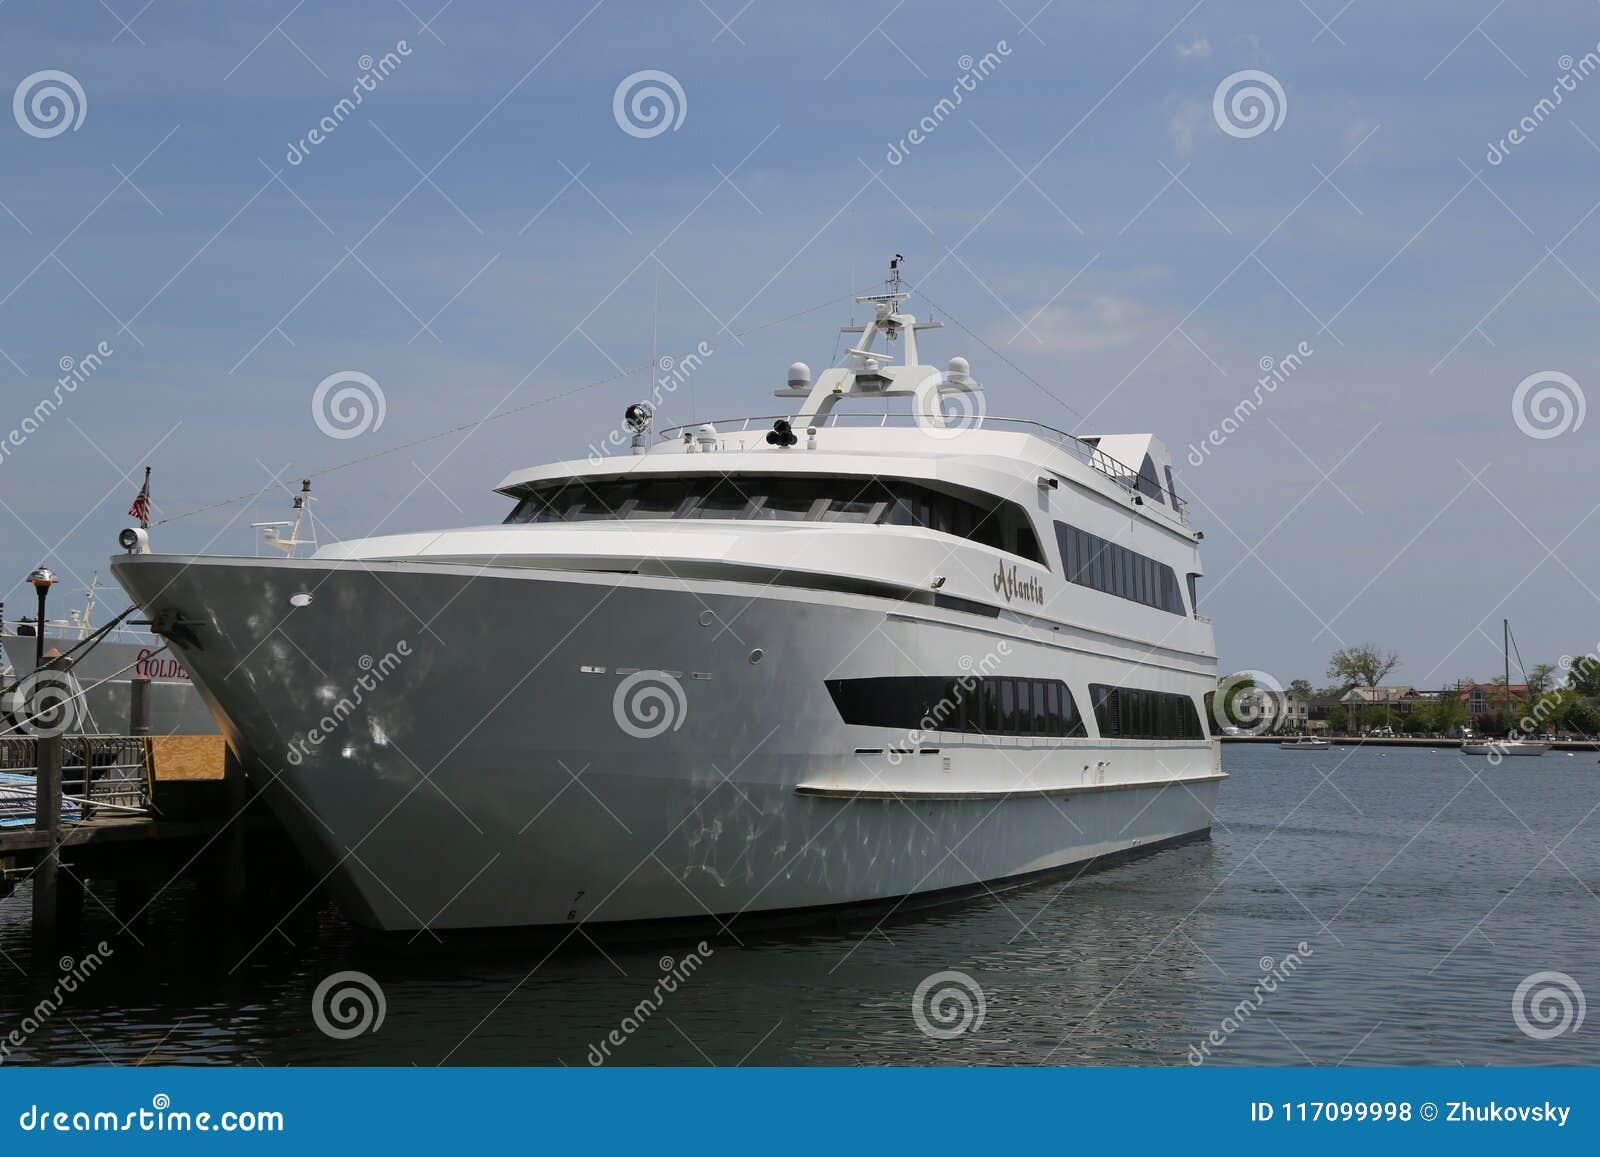 Luxury Atlantis Yacht Charter at Sheepshead Bay Marina in Brooklyn